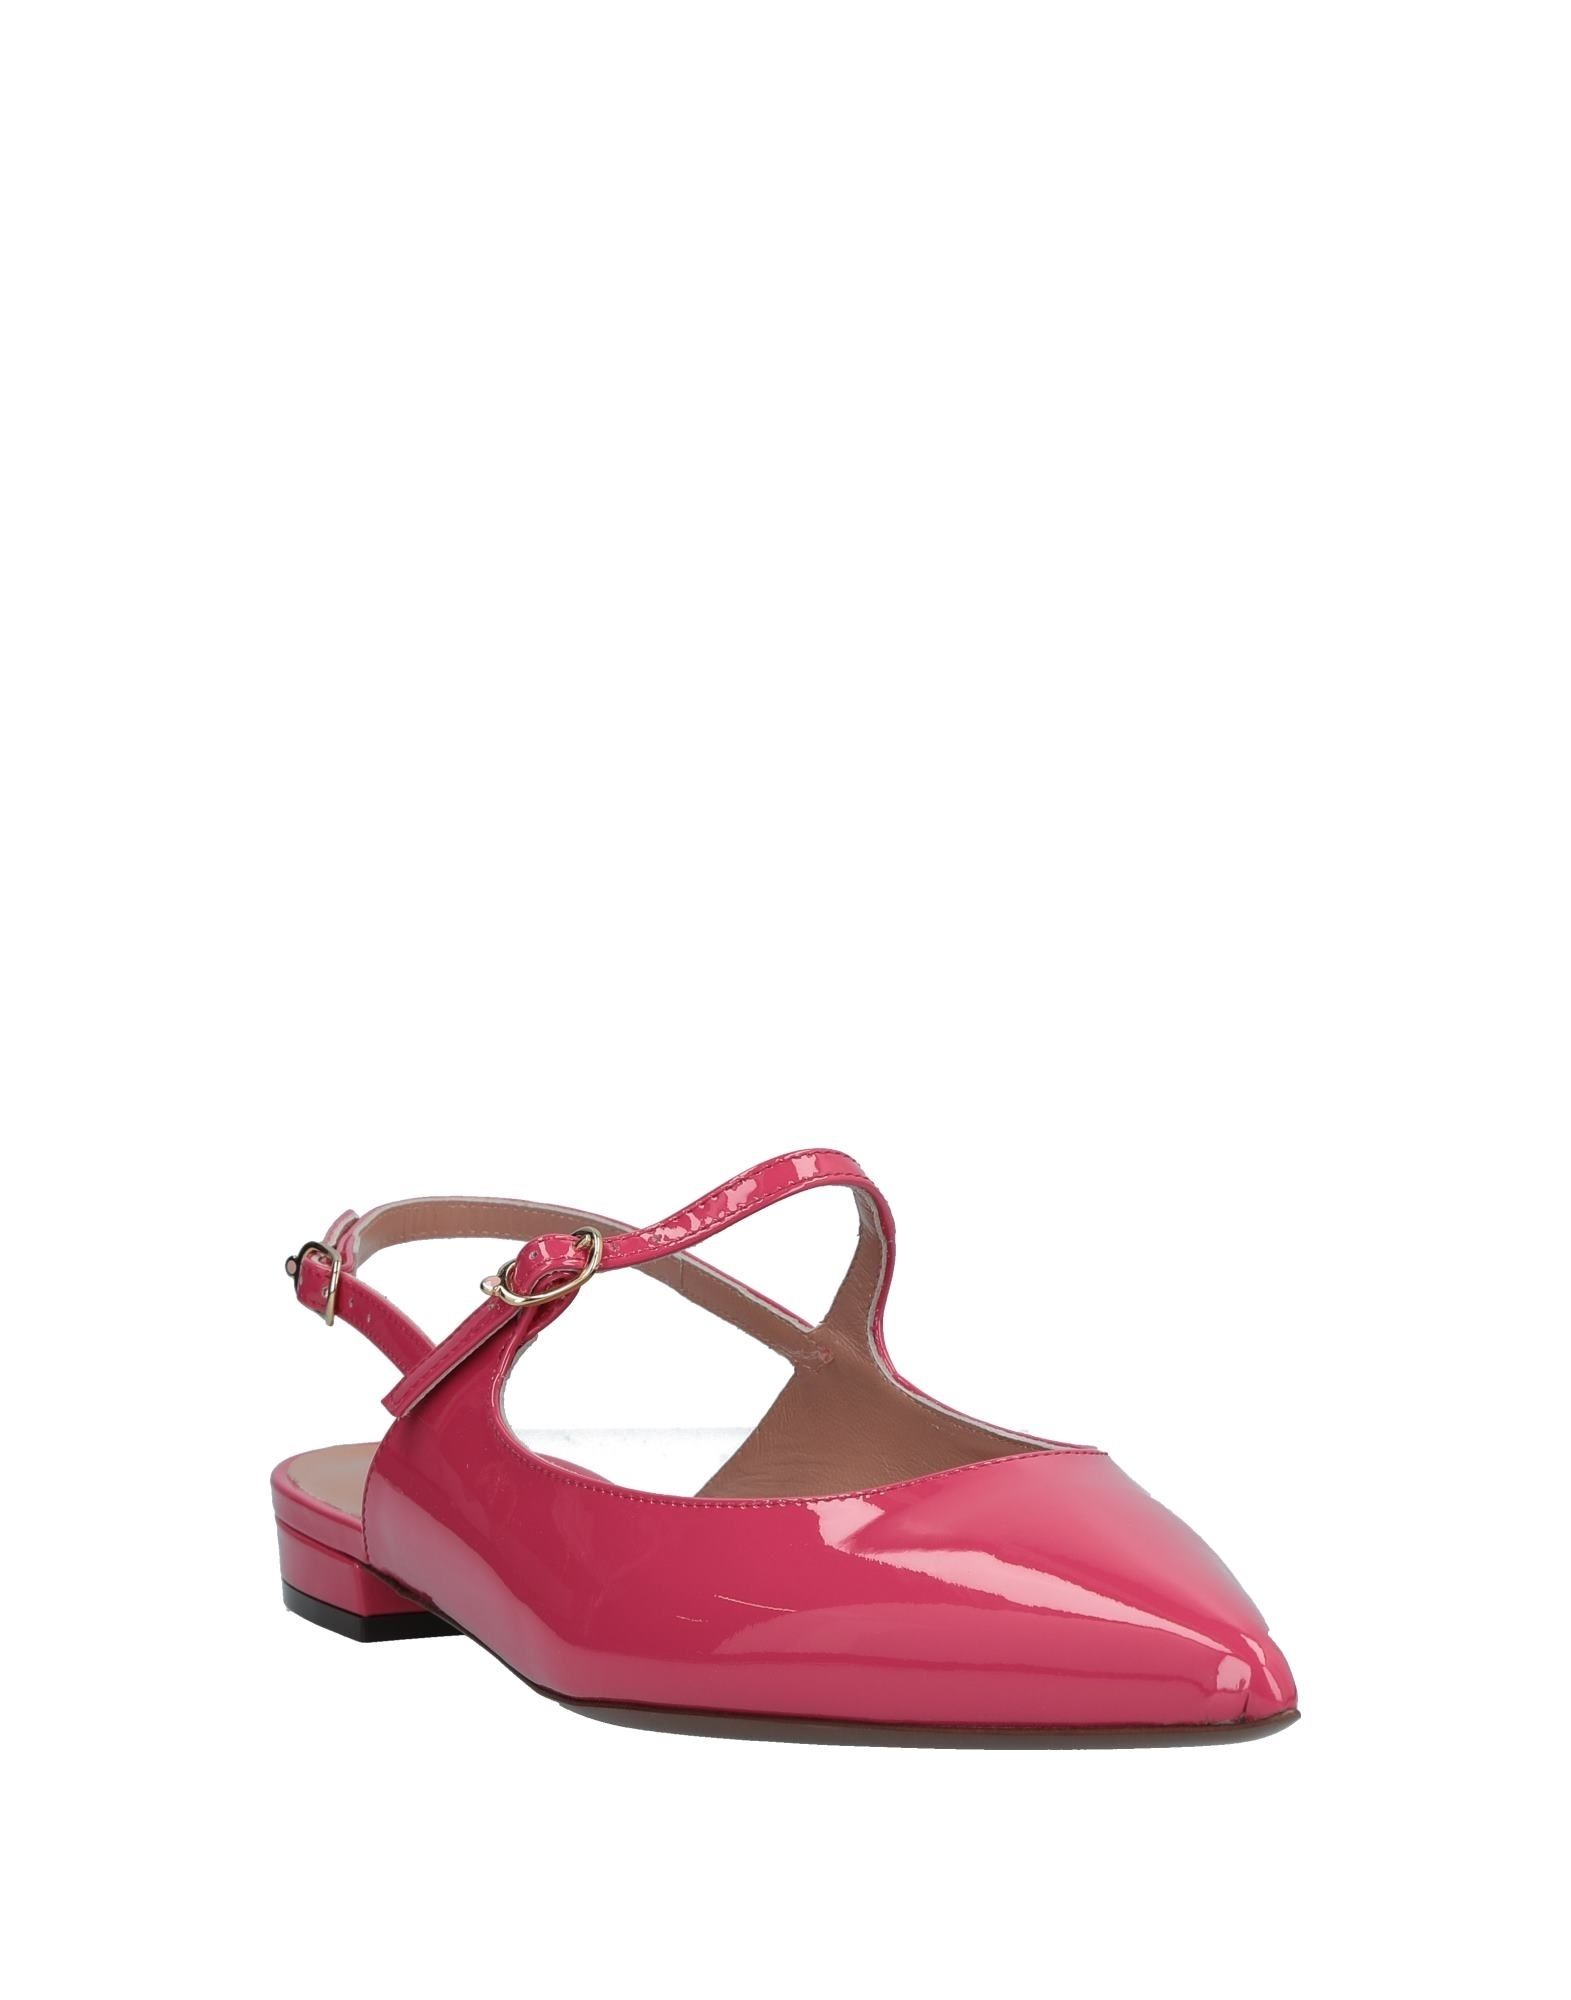 L' Autre Chose  Ballerinas Damen  Chose 11529773HU Neue Schuhe ad3eae